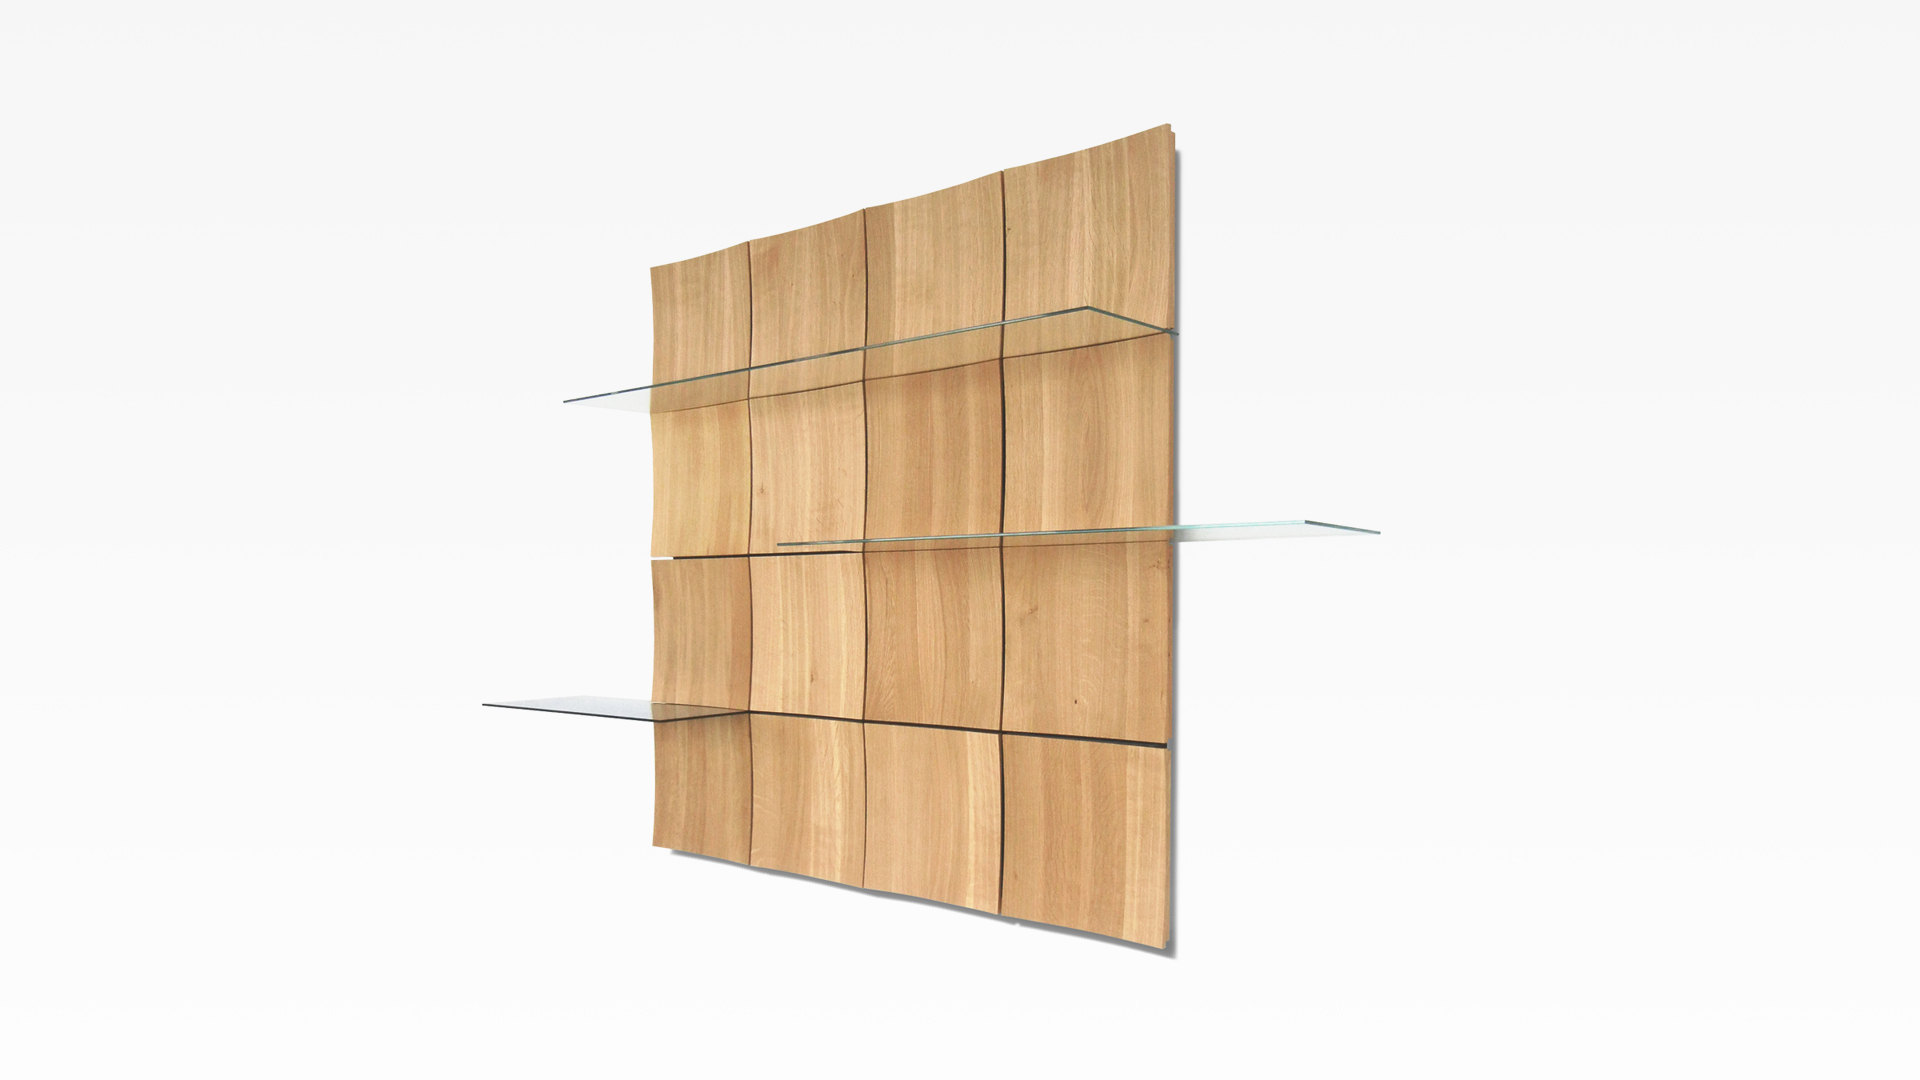 rs01 nami regal modulares regal modular shelf. Black Bedroom Furniture Sets. Home Design Ideas